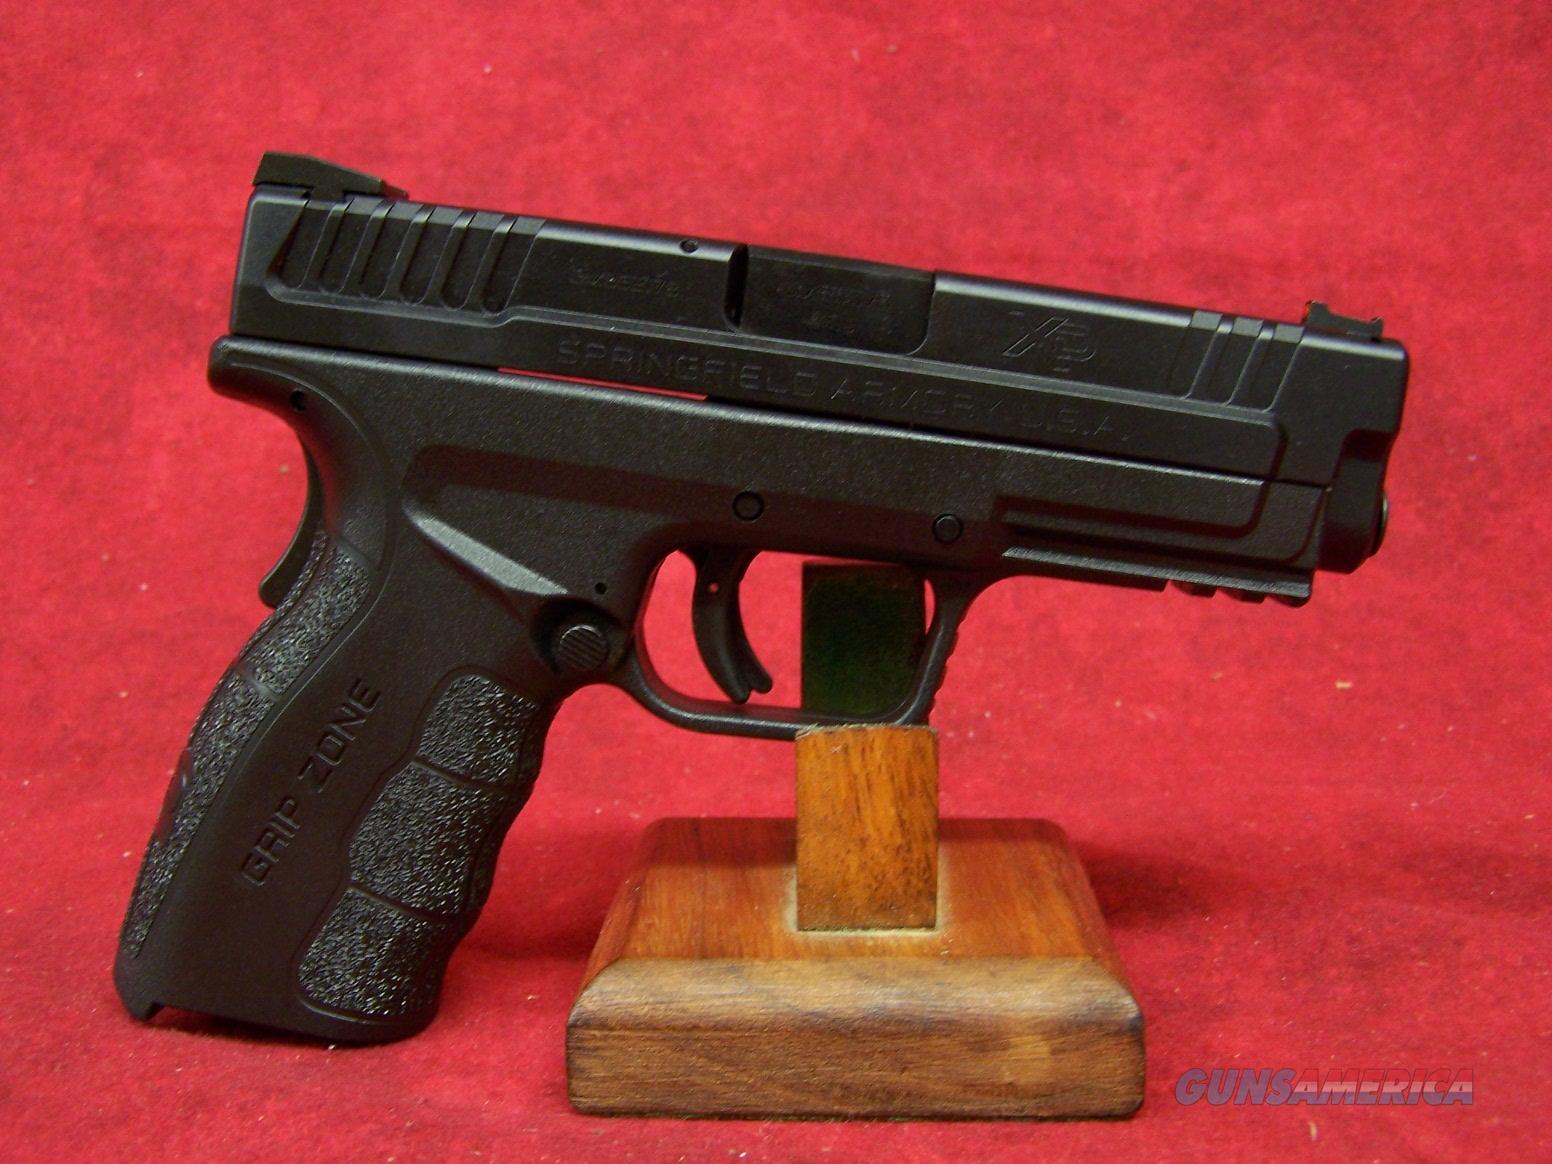 Springfield XD Mod.2 Service Model 9mm 4 Inch Barrel (XDG9101HC)  Guns > Pistols > Springfield Armory Pistols > XD (eXtreme Duty)